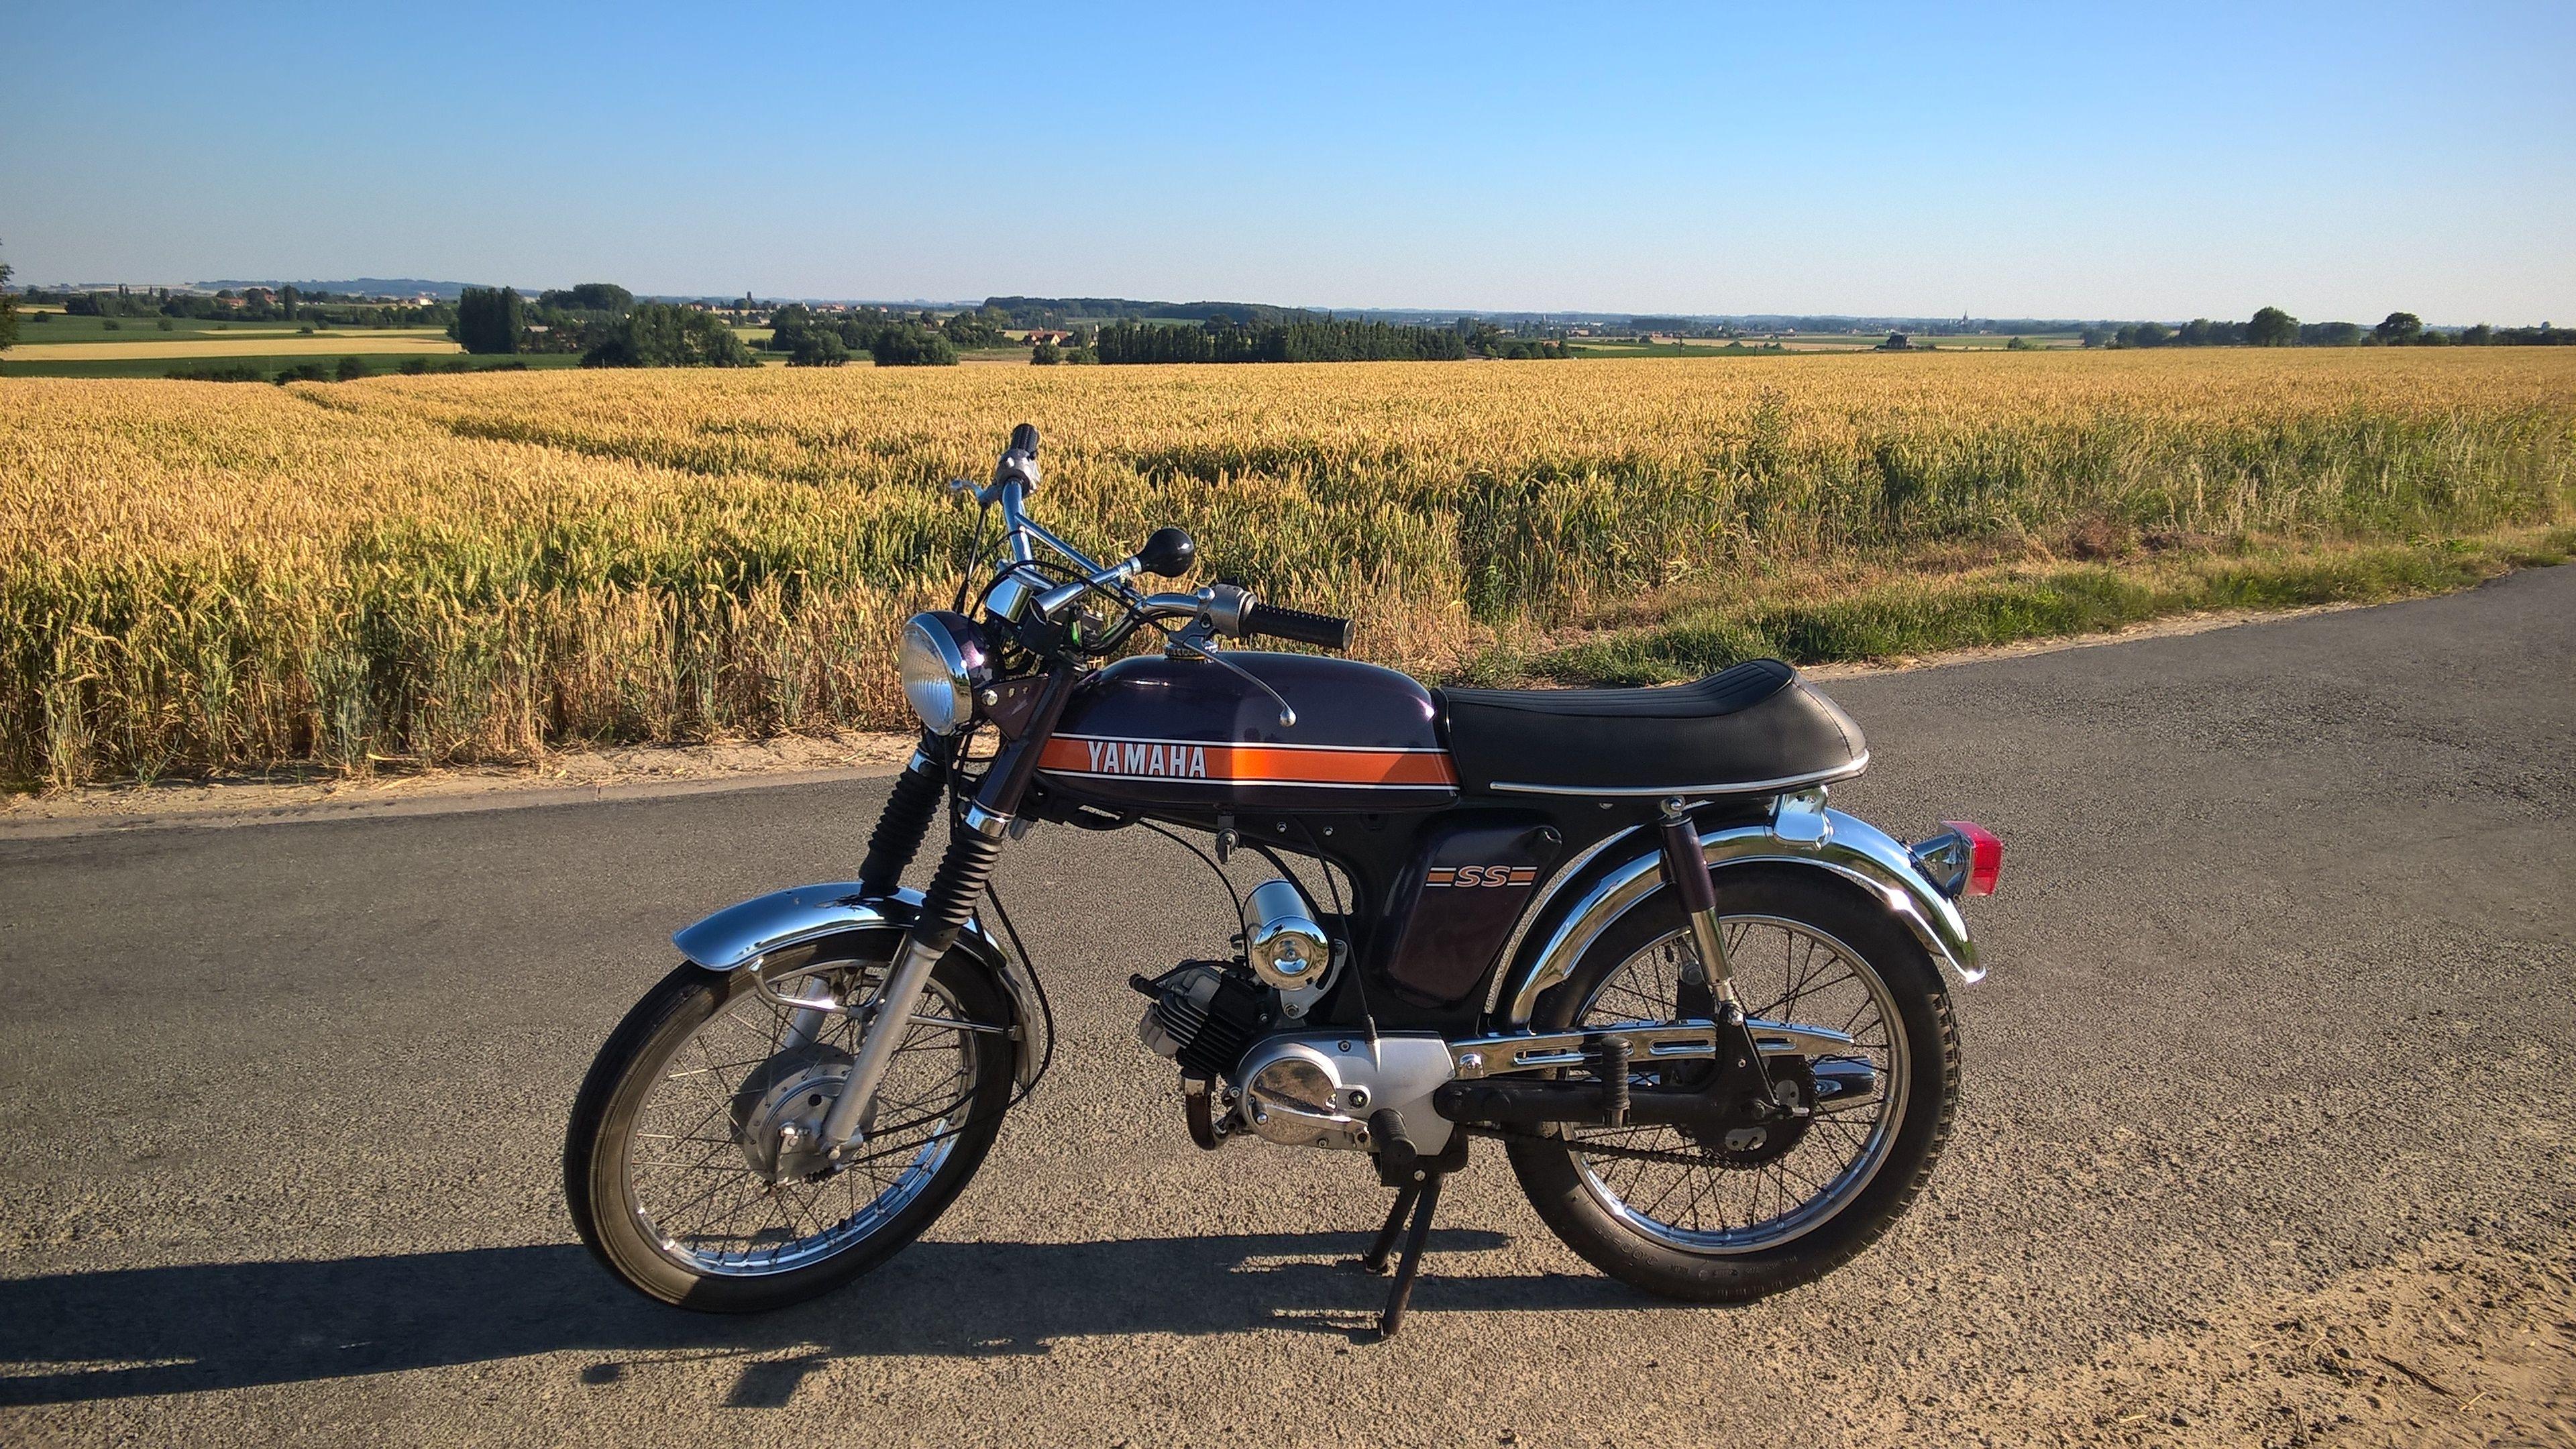 Download wallpaper 1920x1080 yamaha, bike, motorcycle